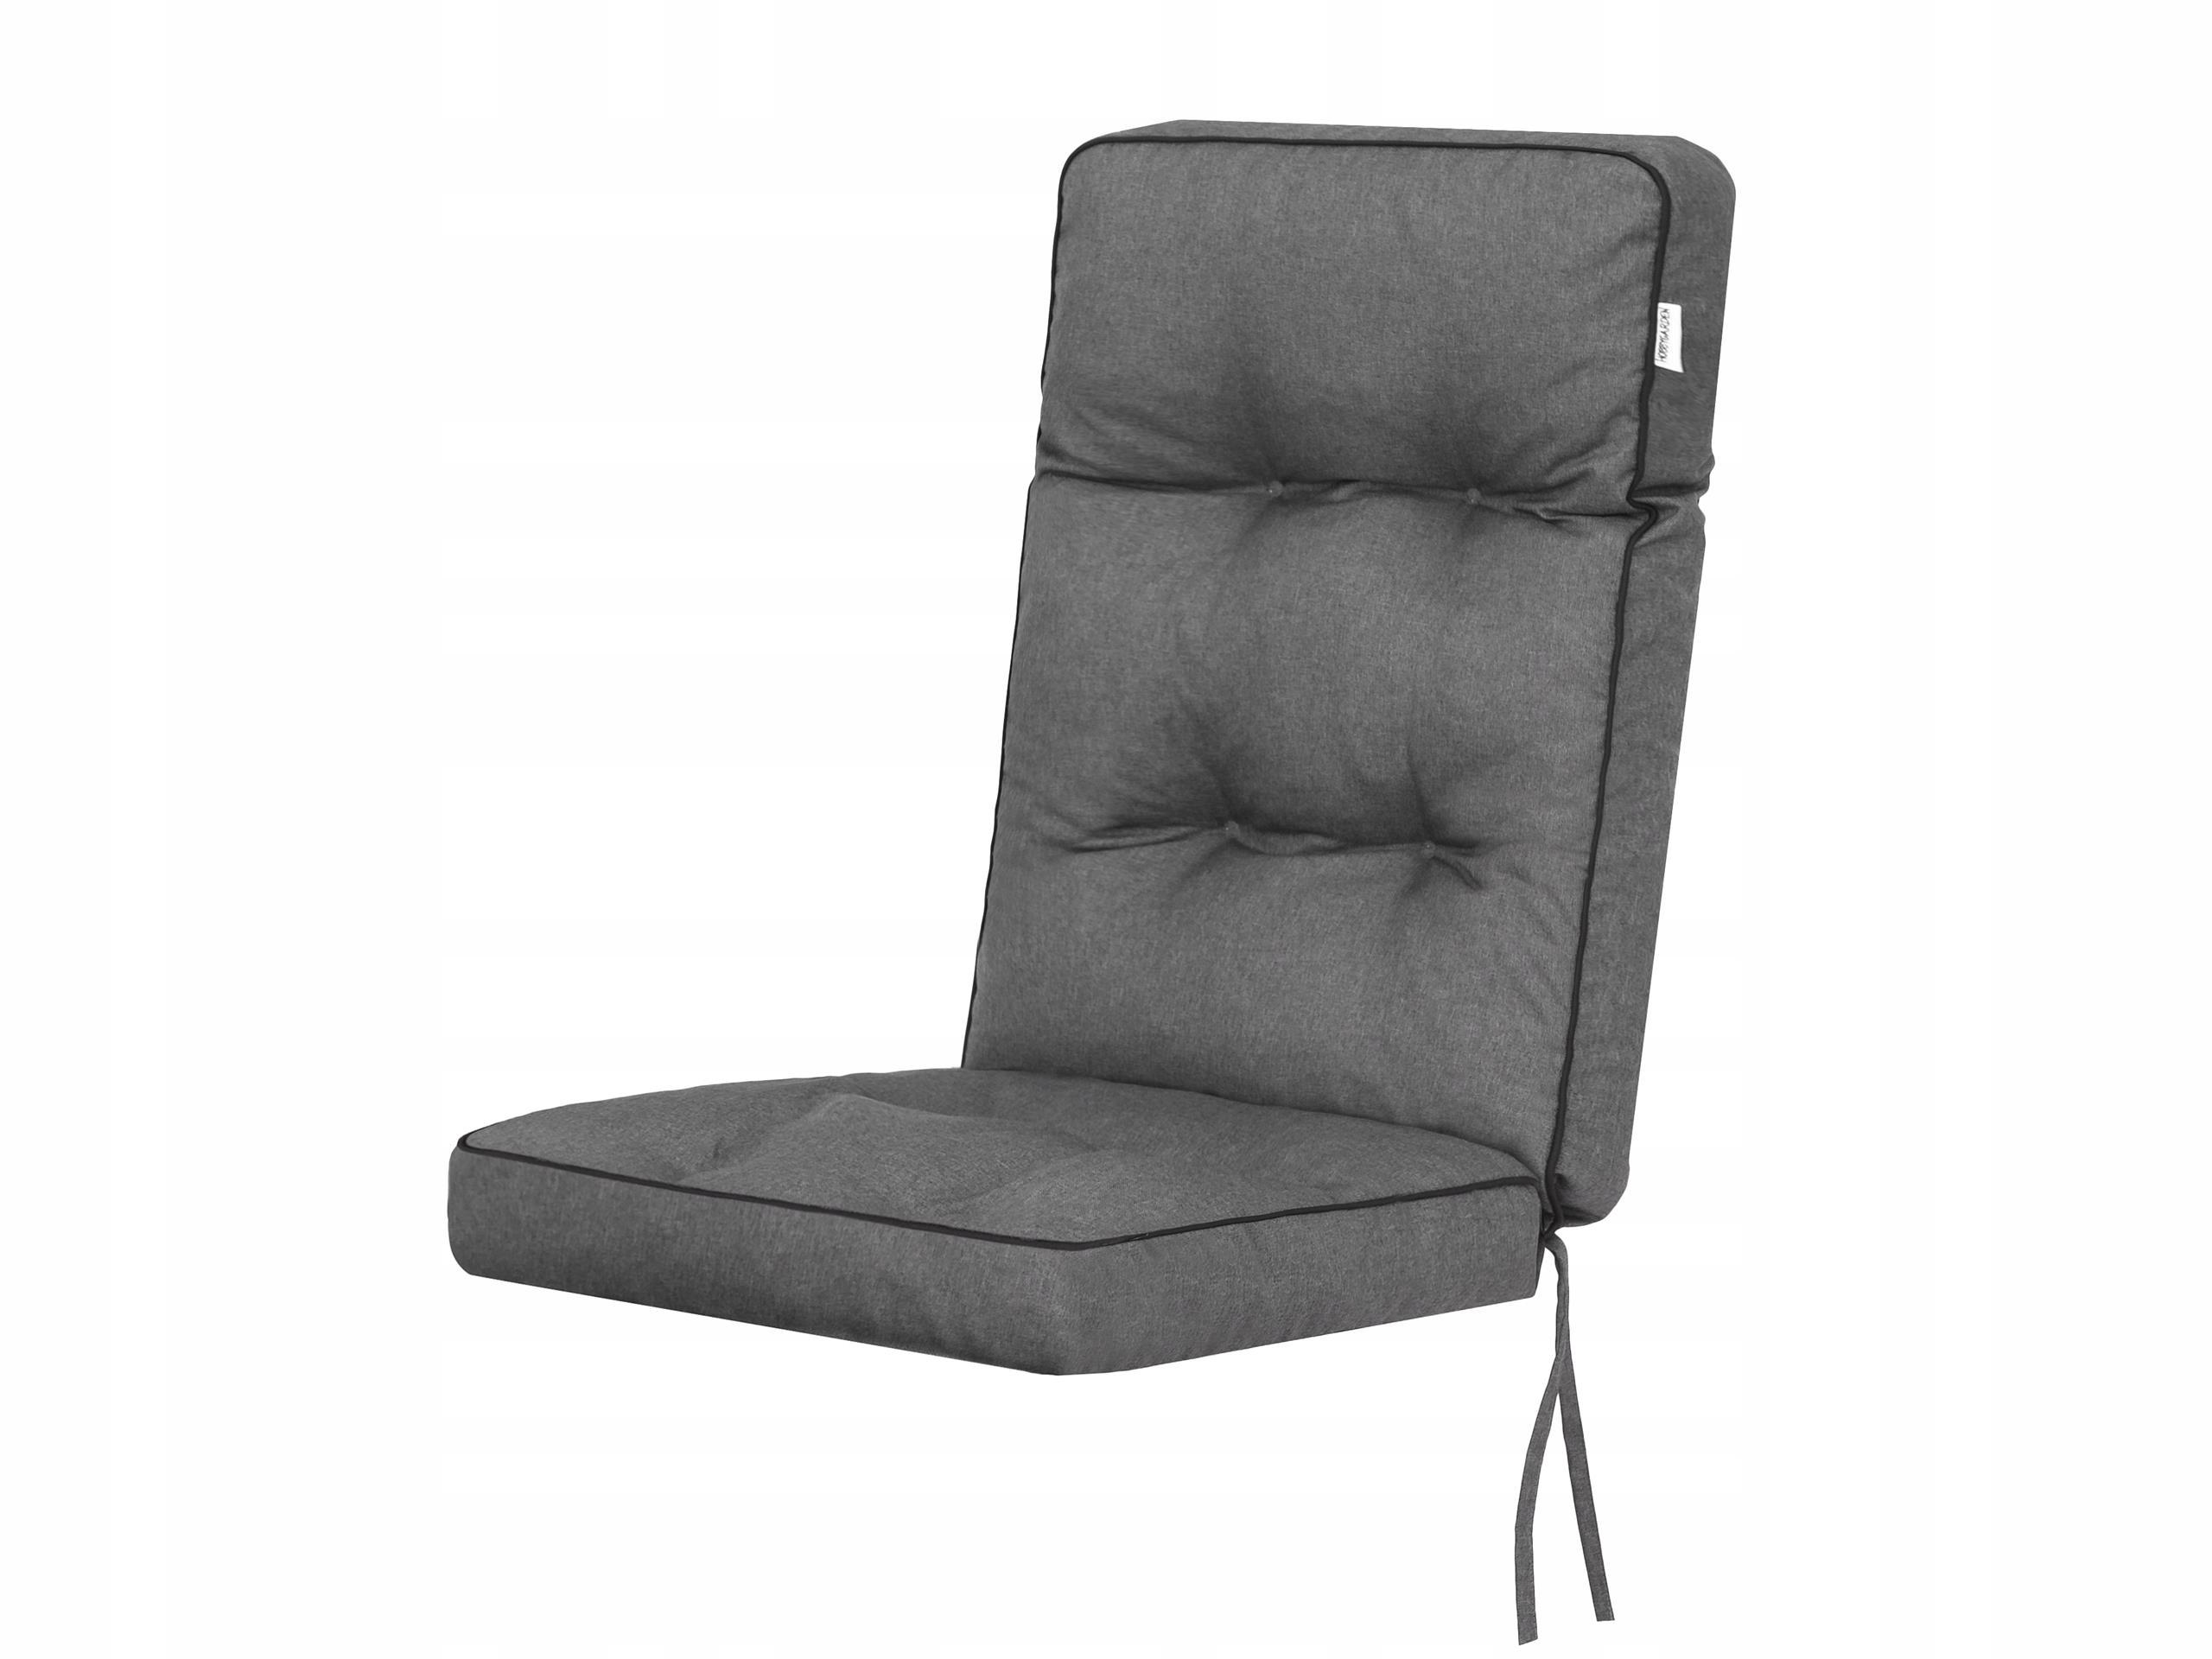 Кресло Cushion Lounger Garden chair 50x50x70